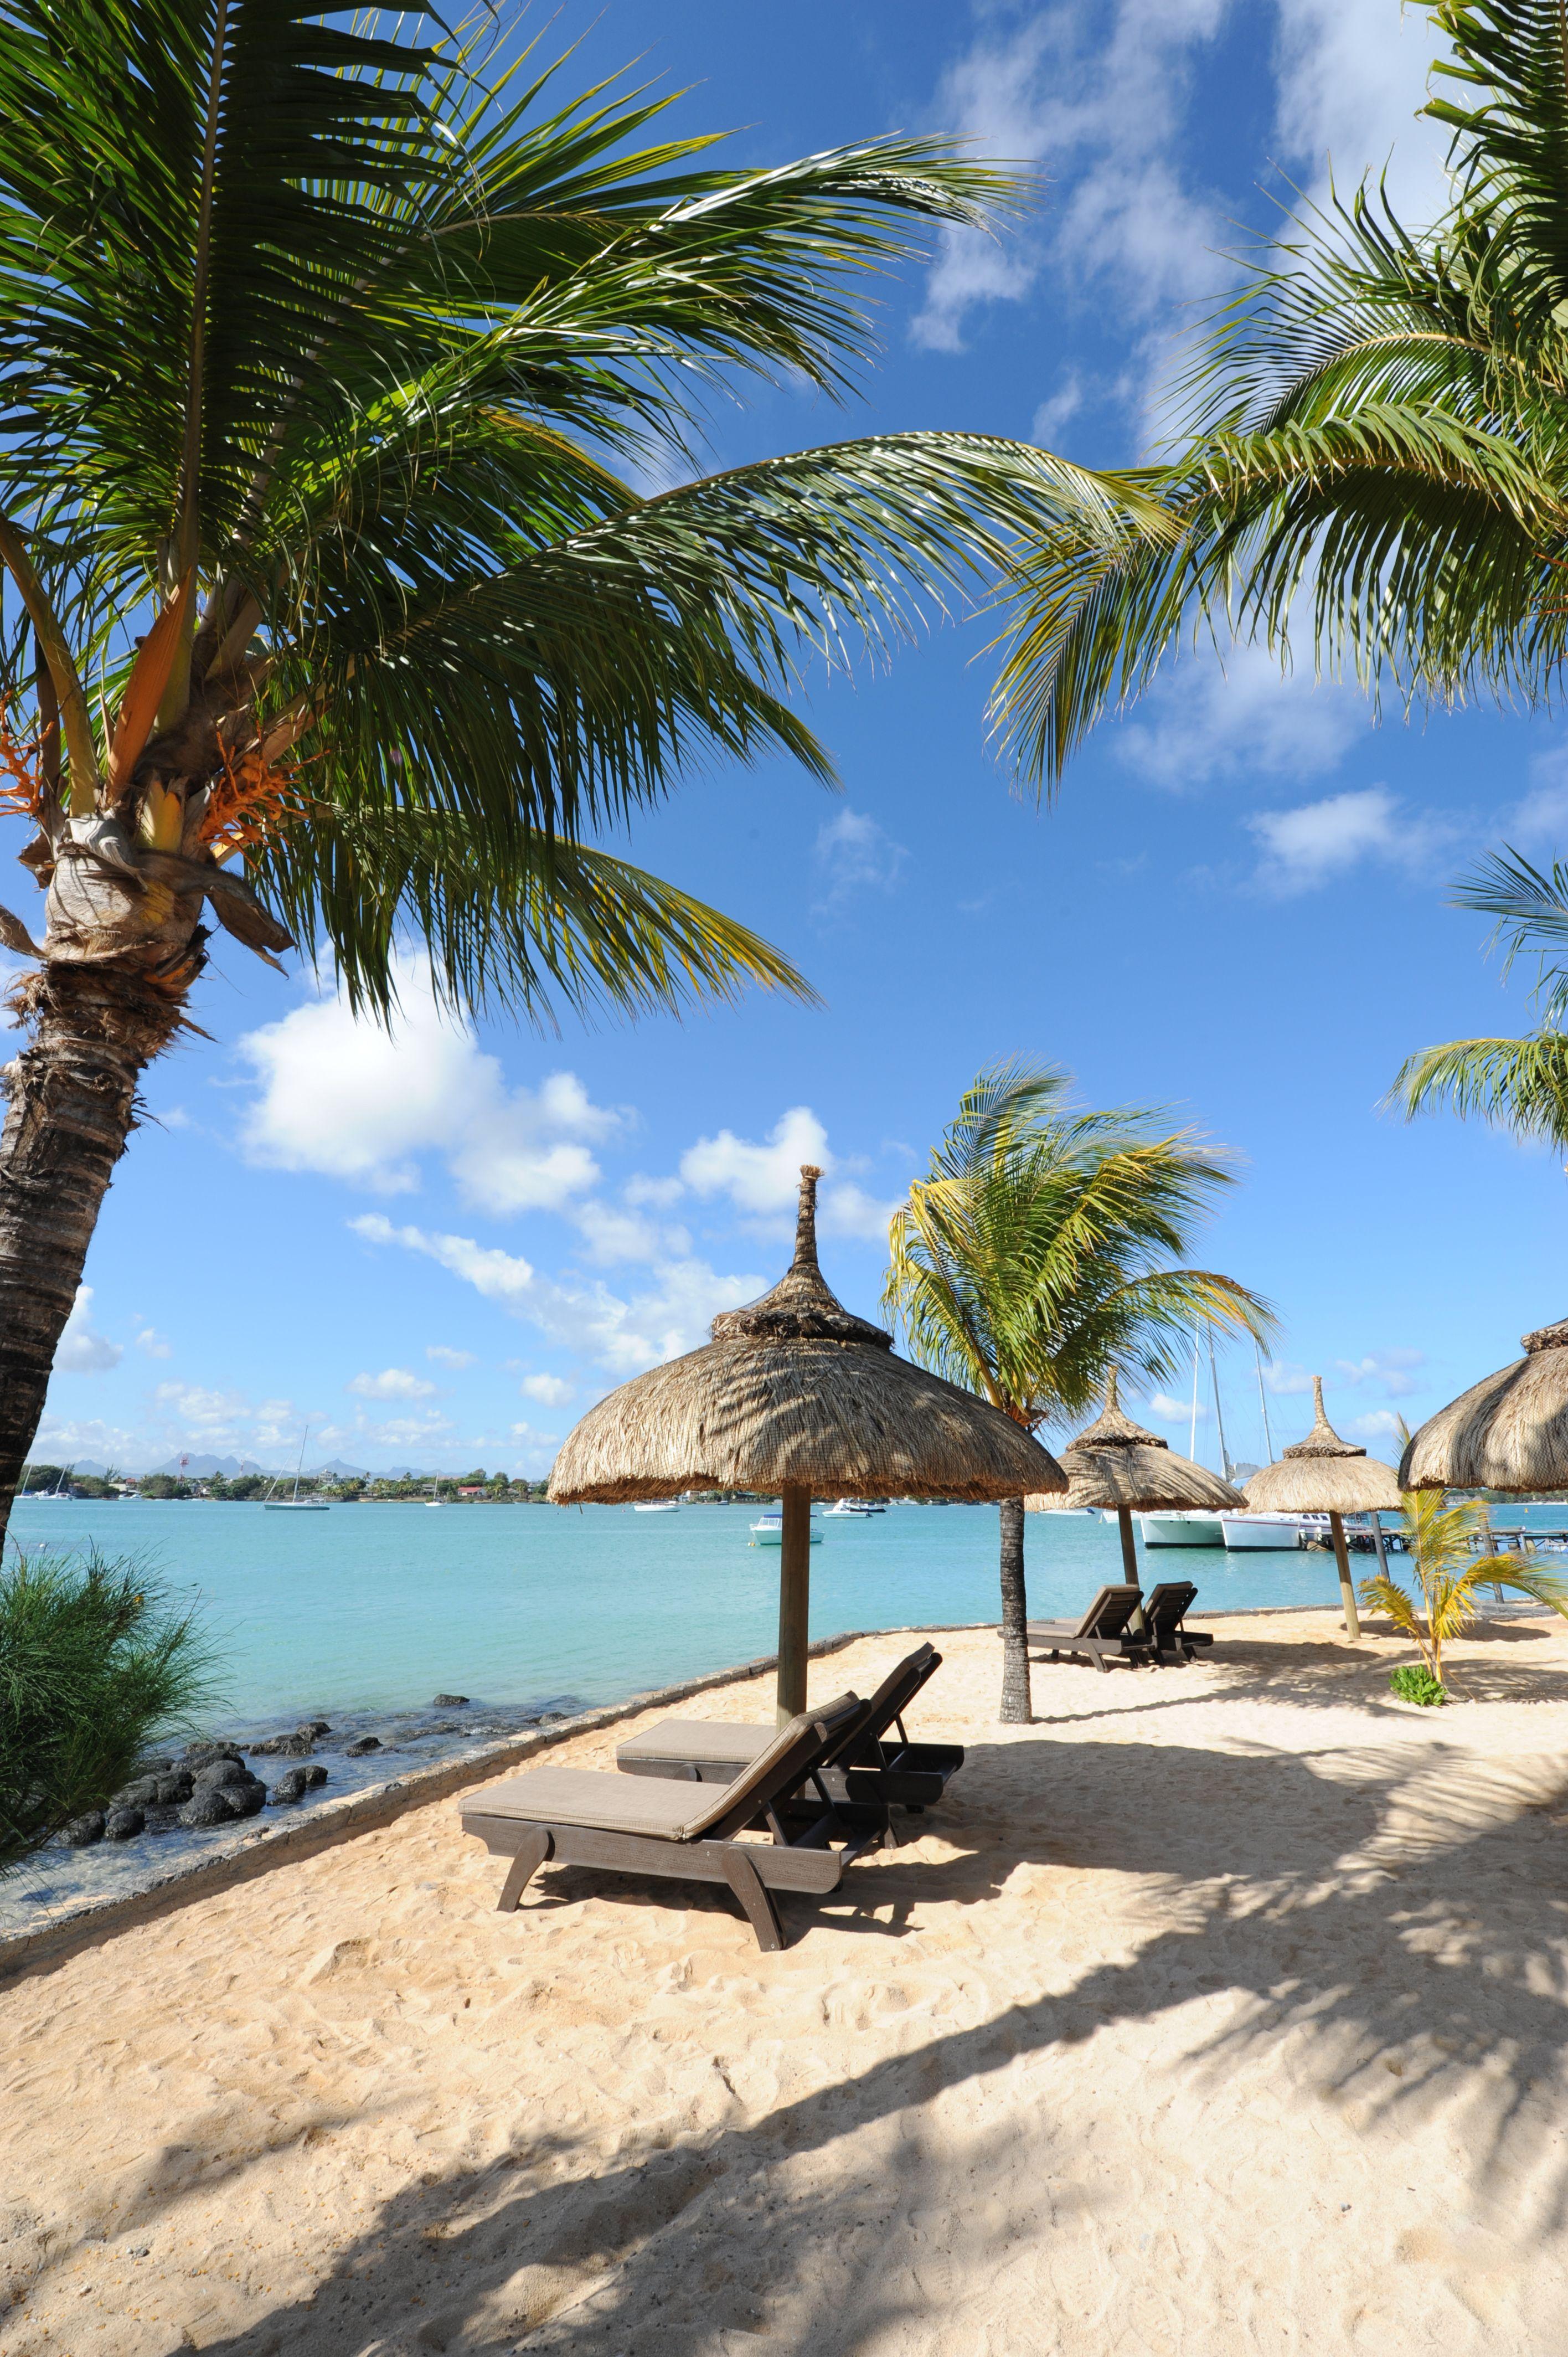 beach at Veranda Grand-Baie | Veranda Grand Baie | Mauritius